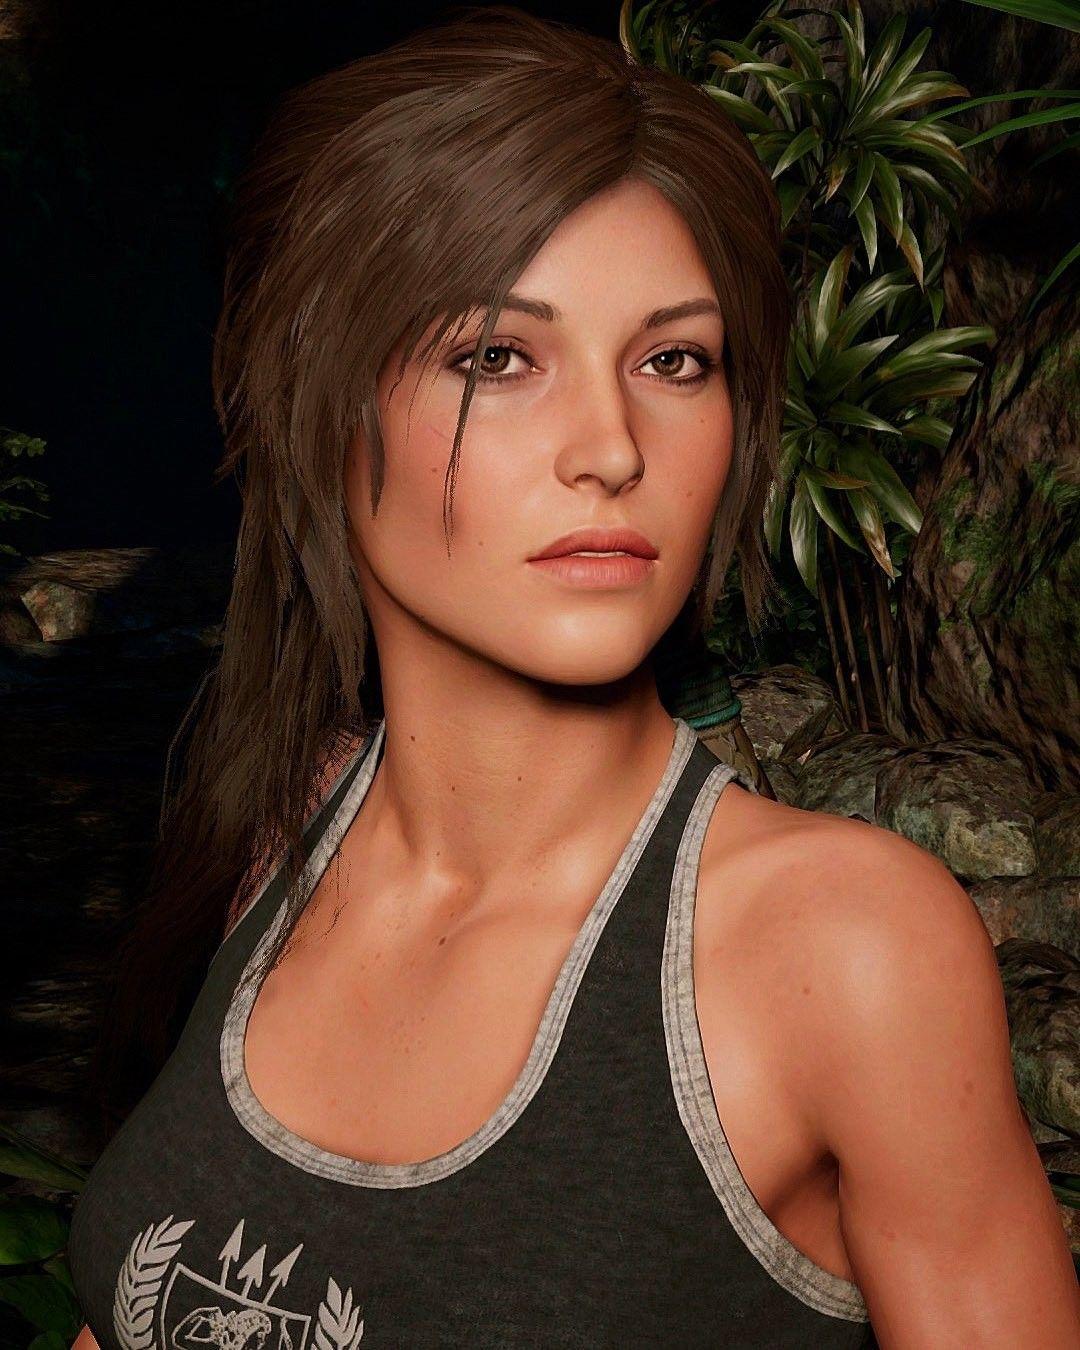 Pin By Trandafir Produtions On Tomb Raider Lara Croft In 2020